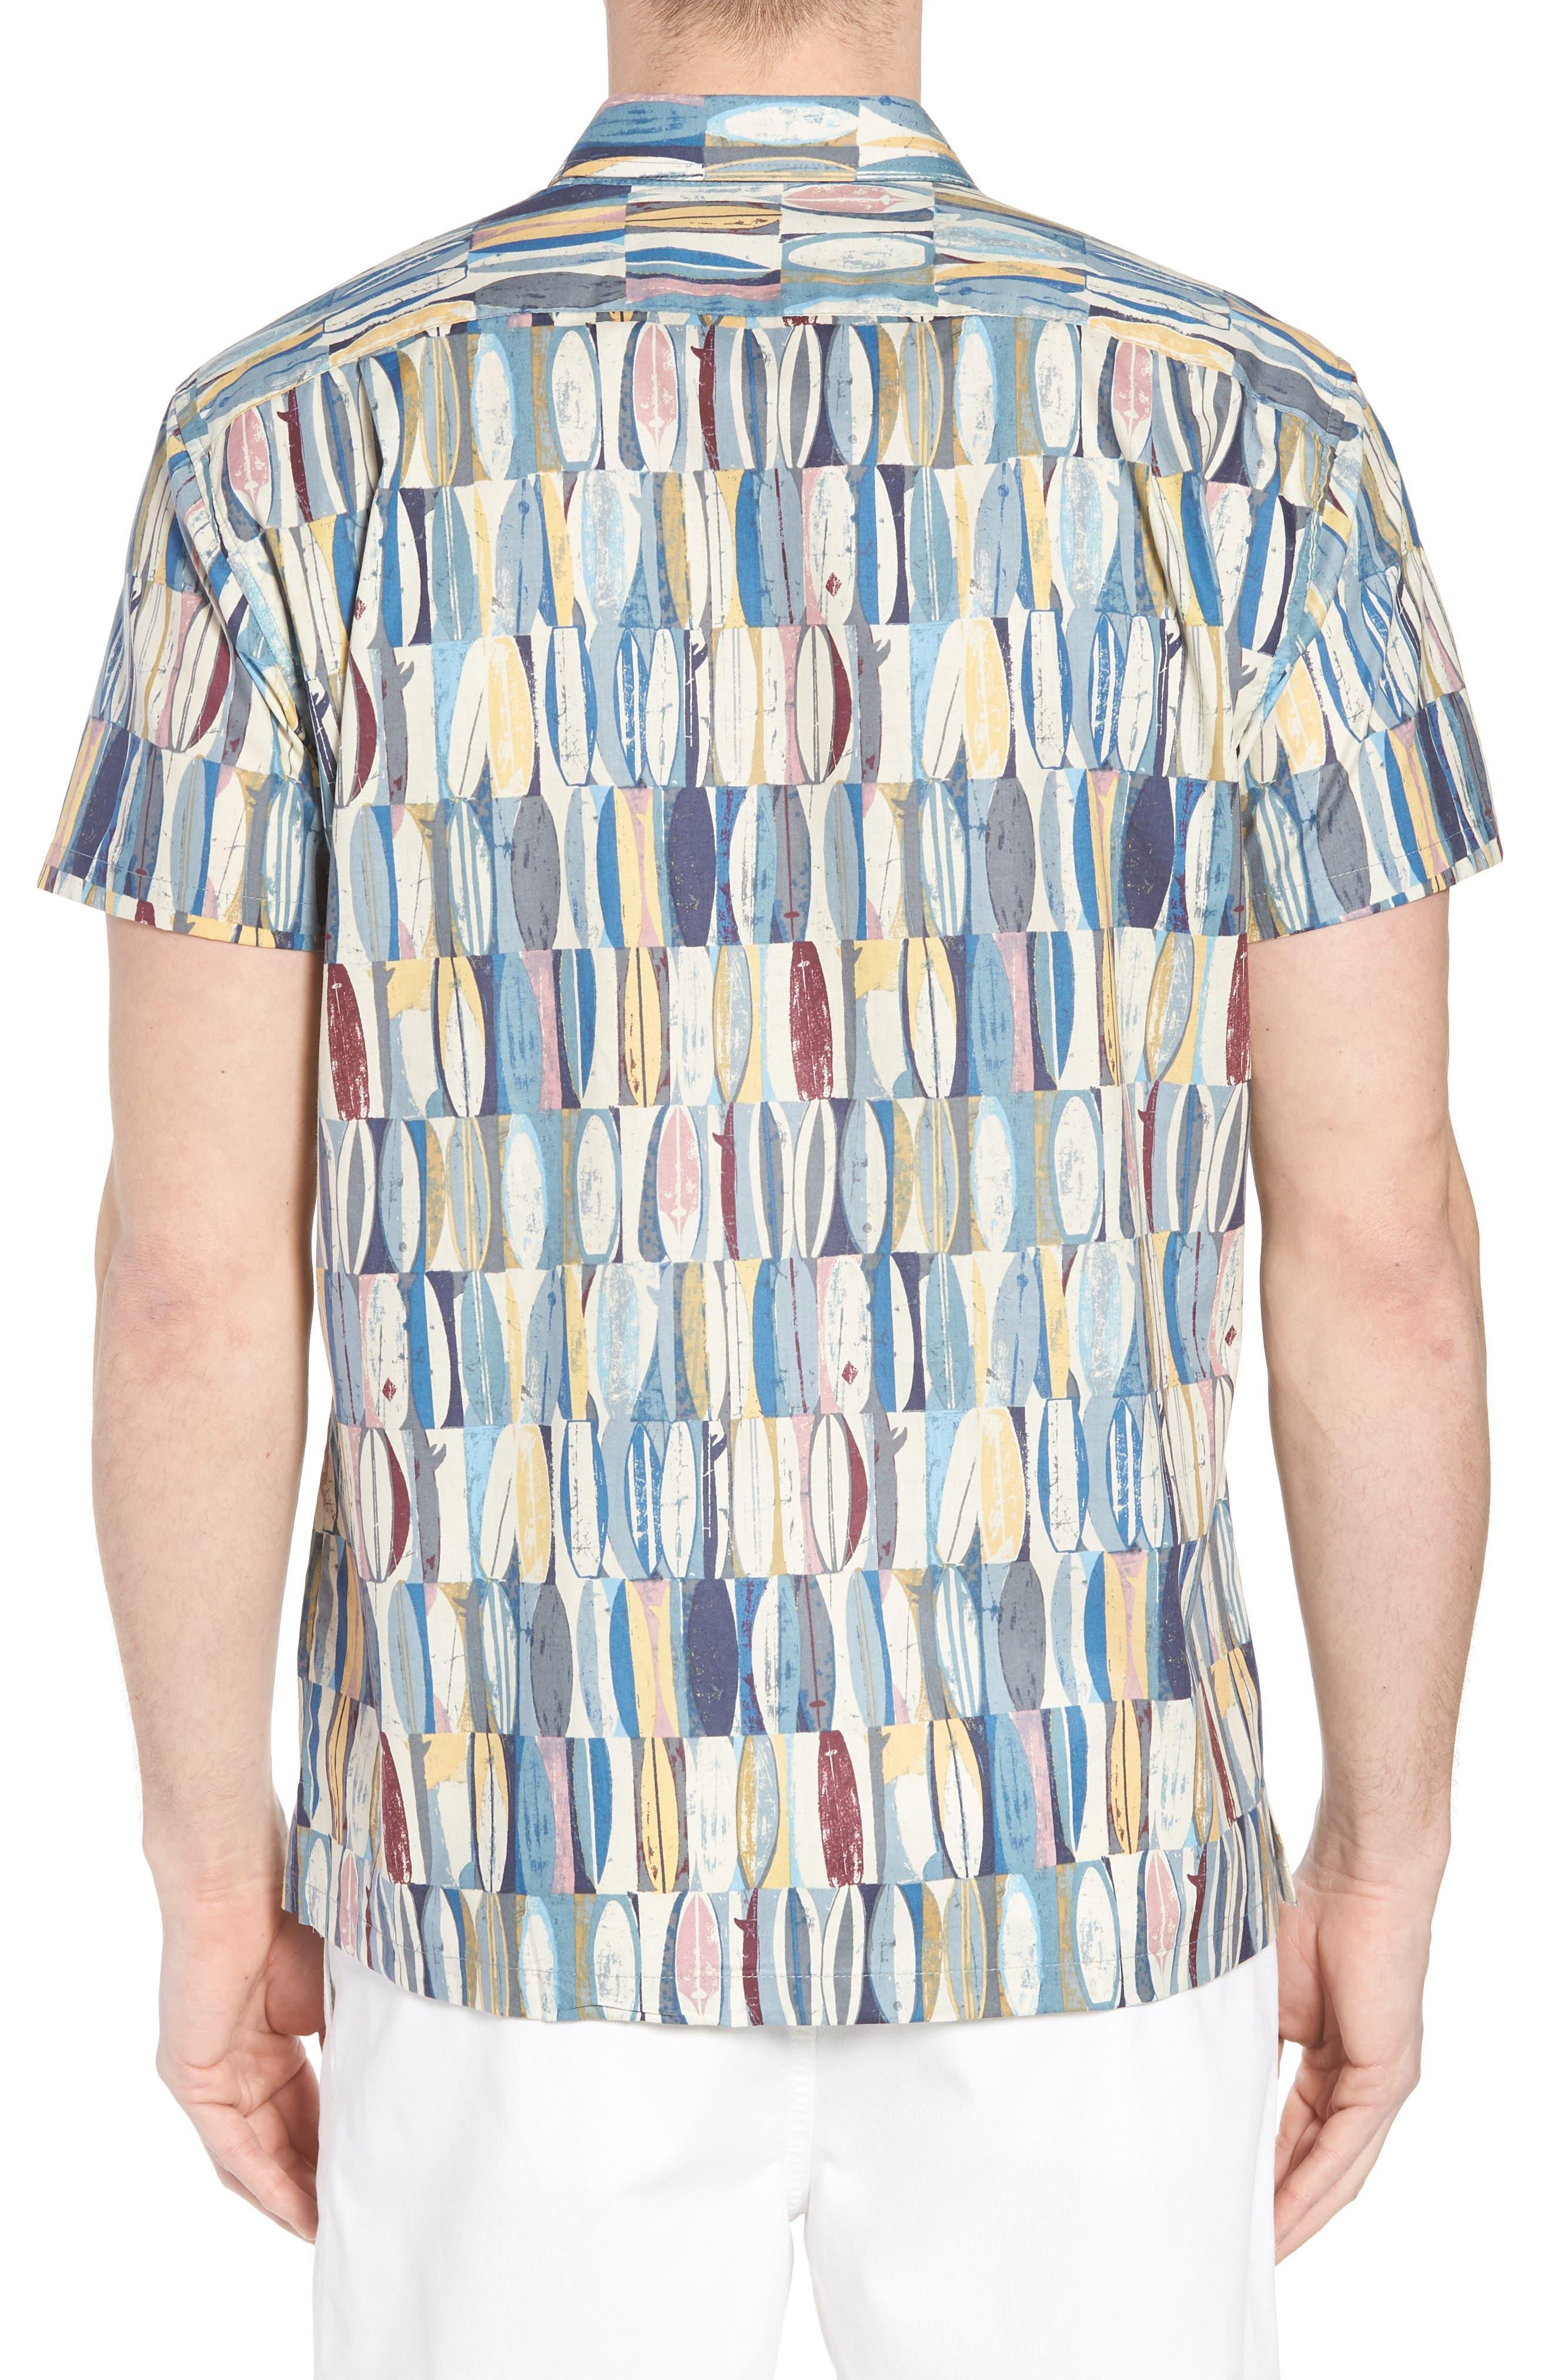 Board Room Trim Fit Camp Shirt,                             Alternate thumbnail 3, color,                             Ocean Blue